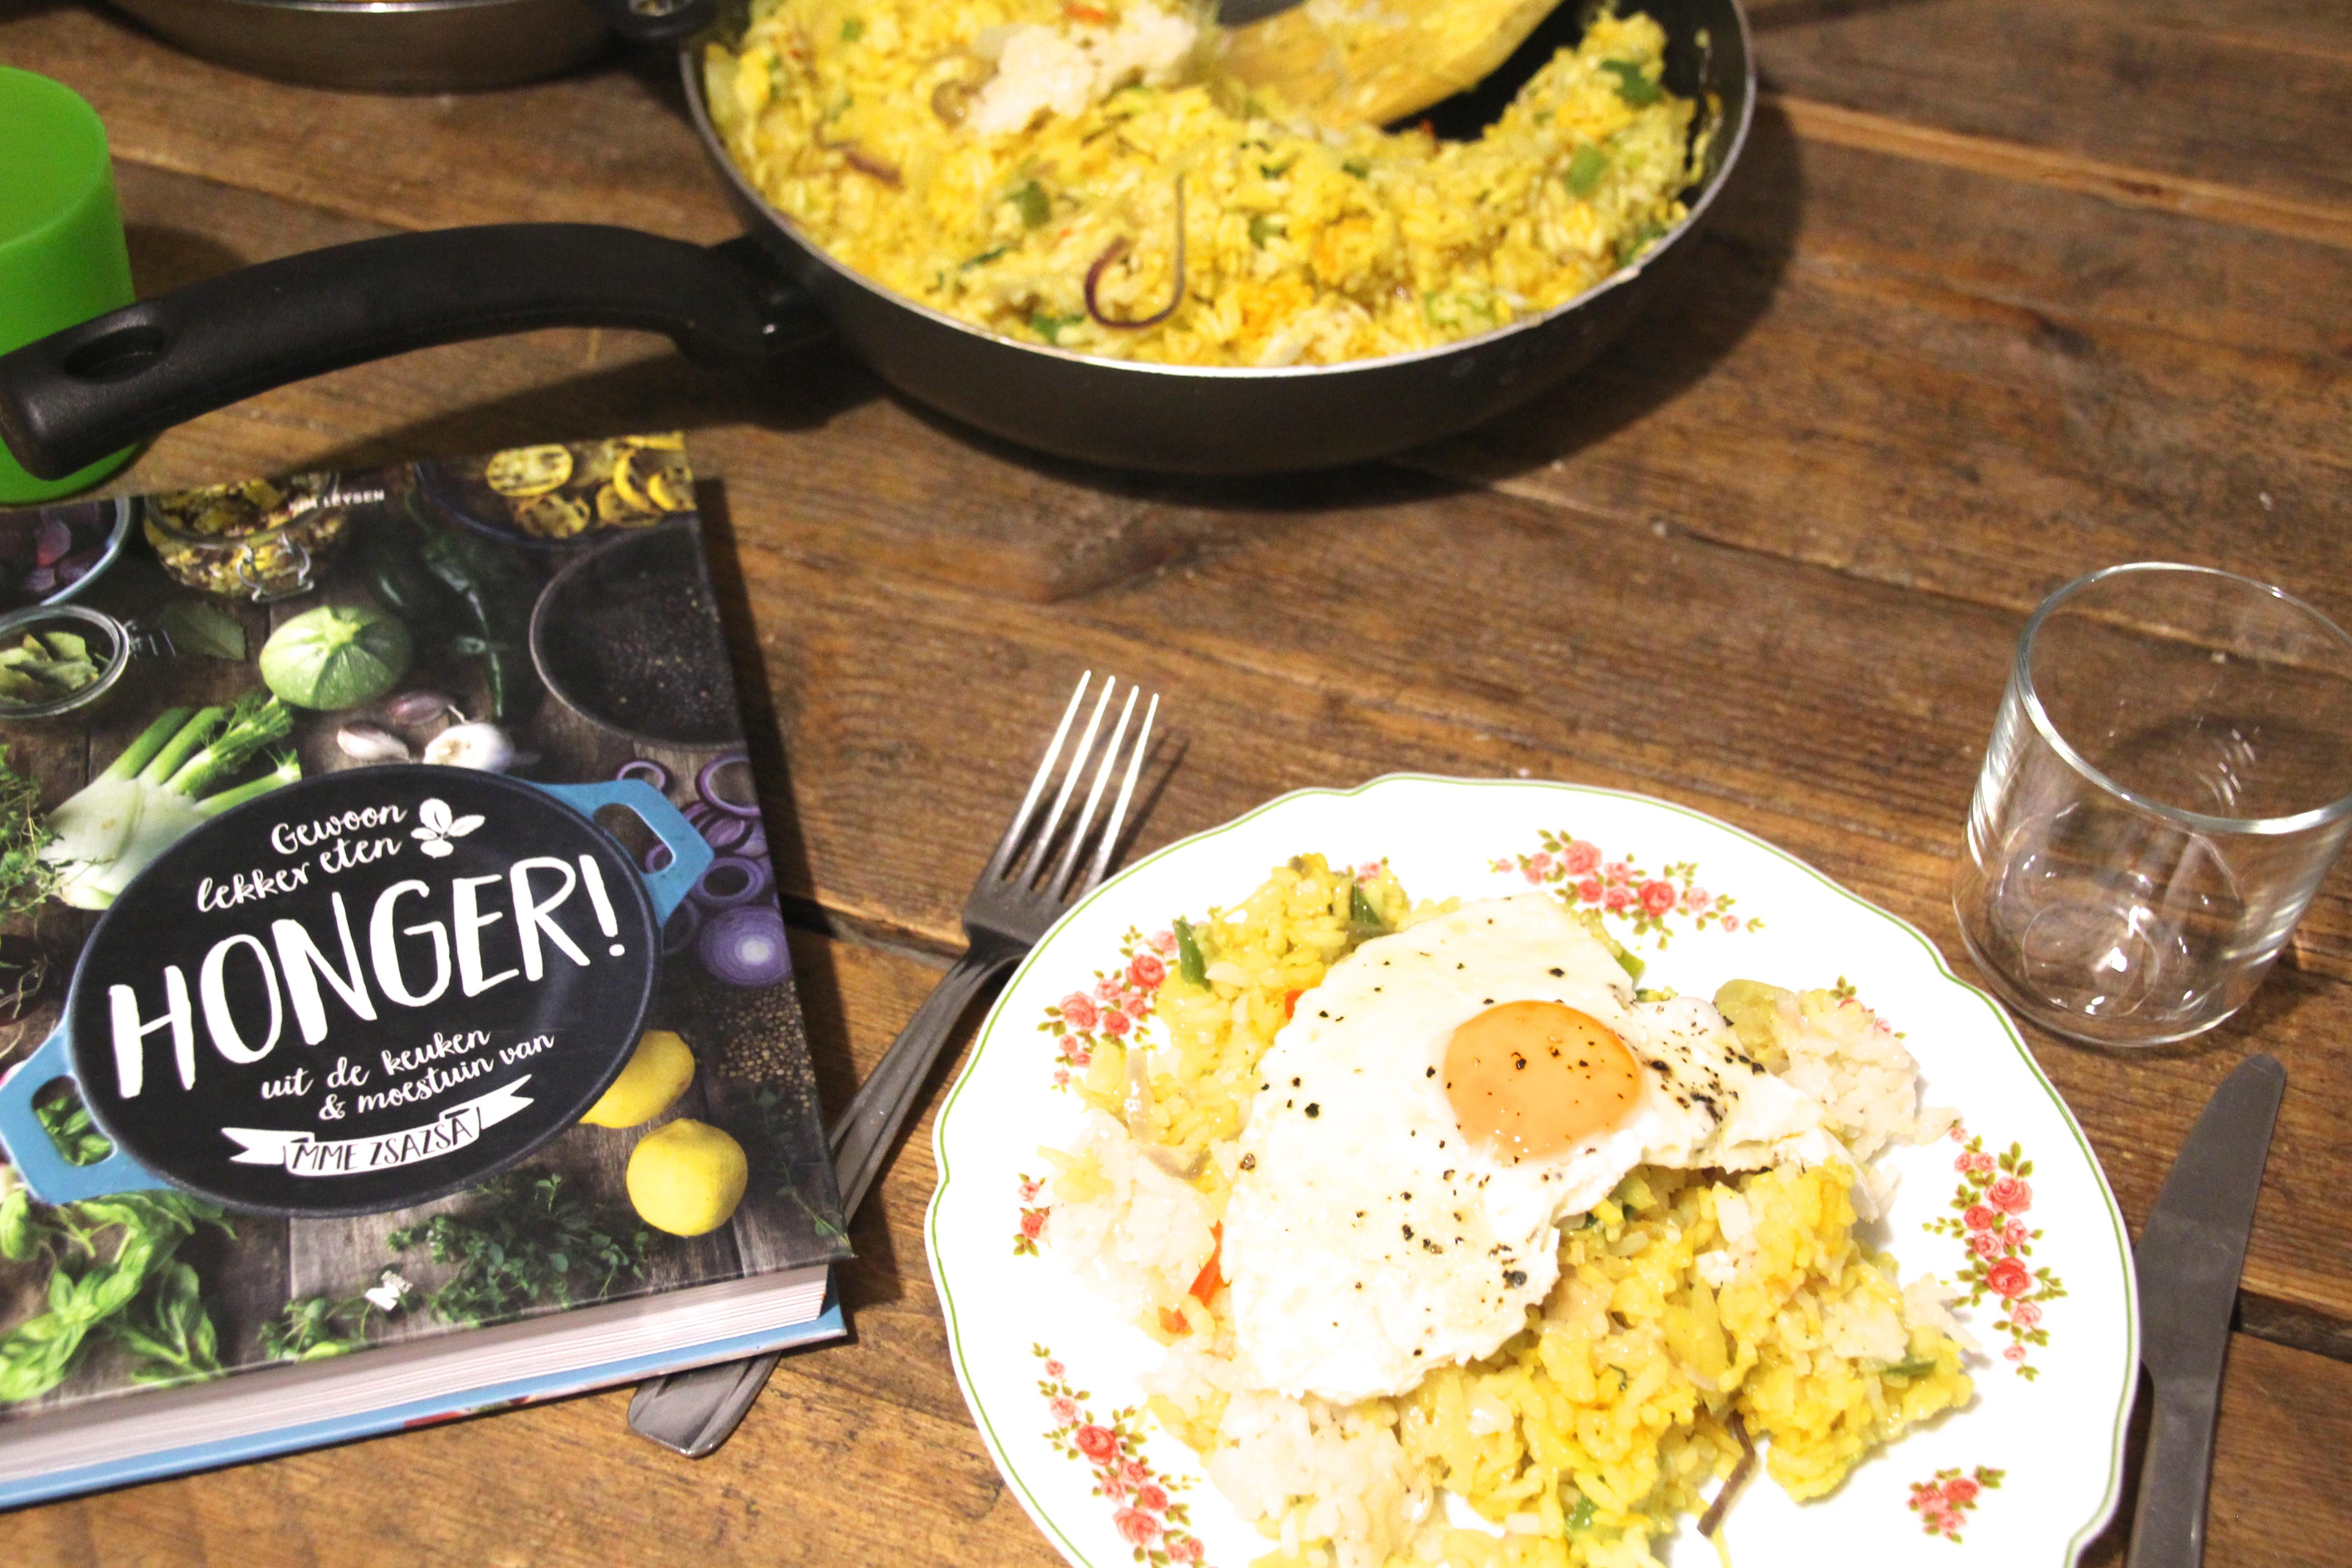 familiekookboeken honger mme zsazsa